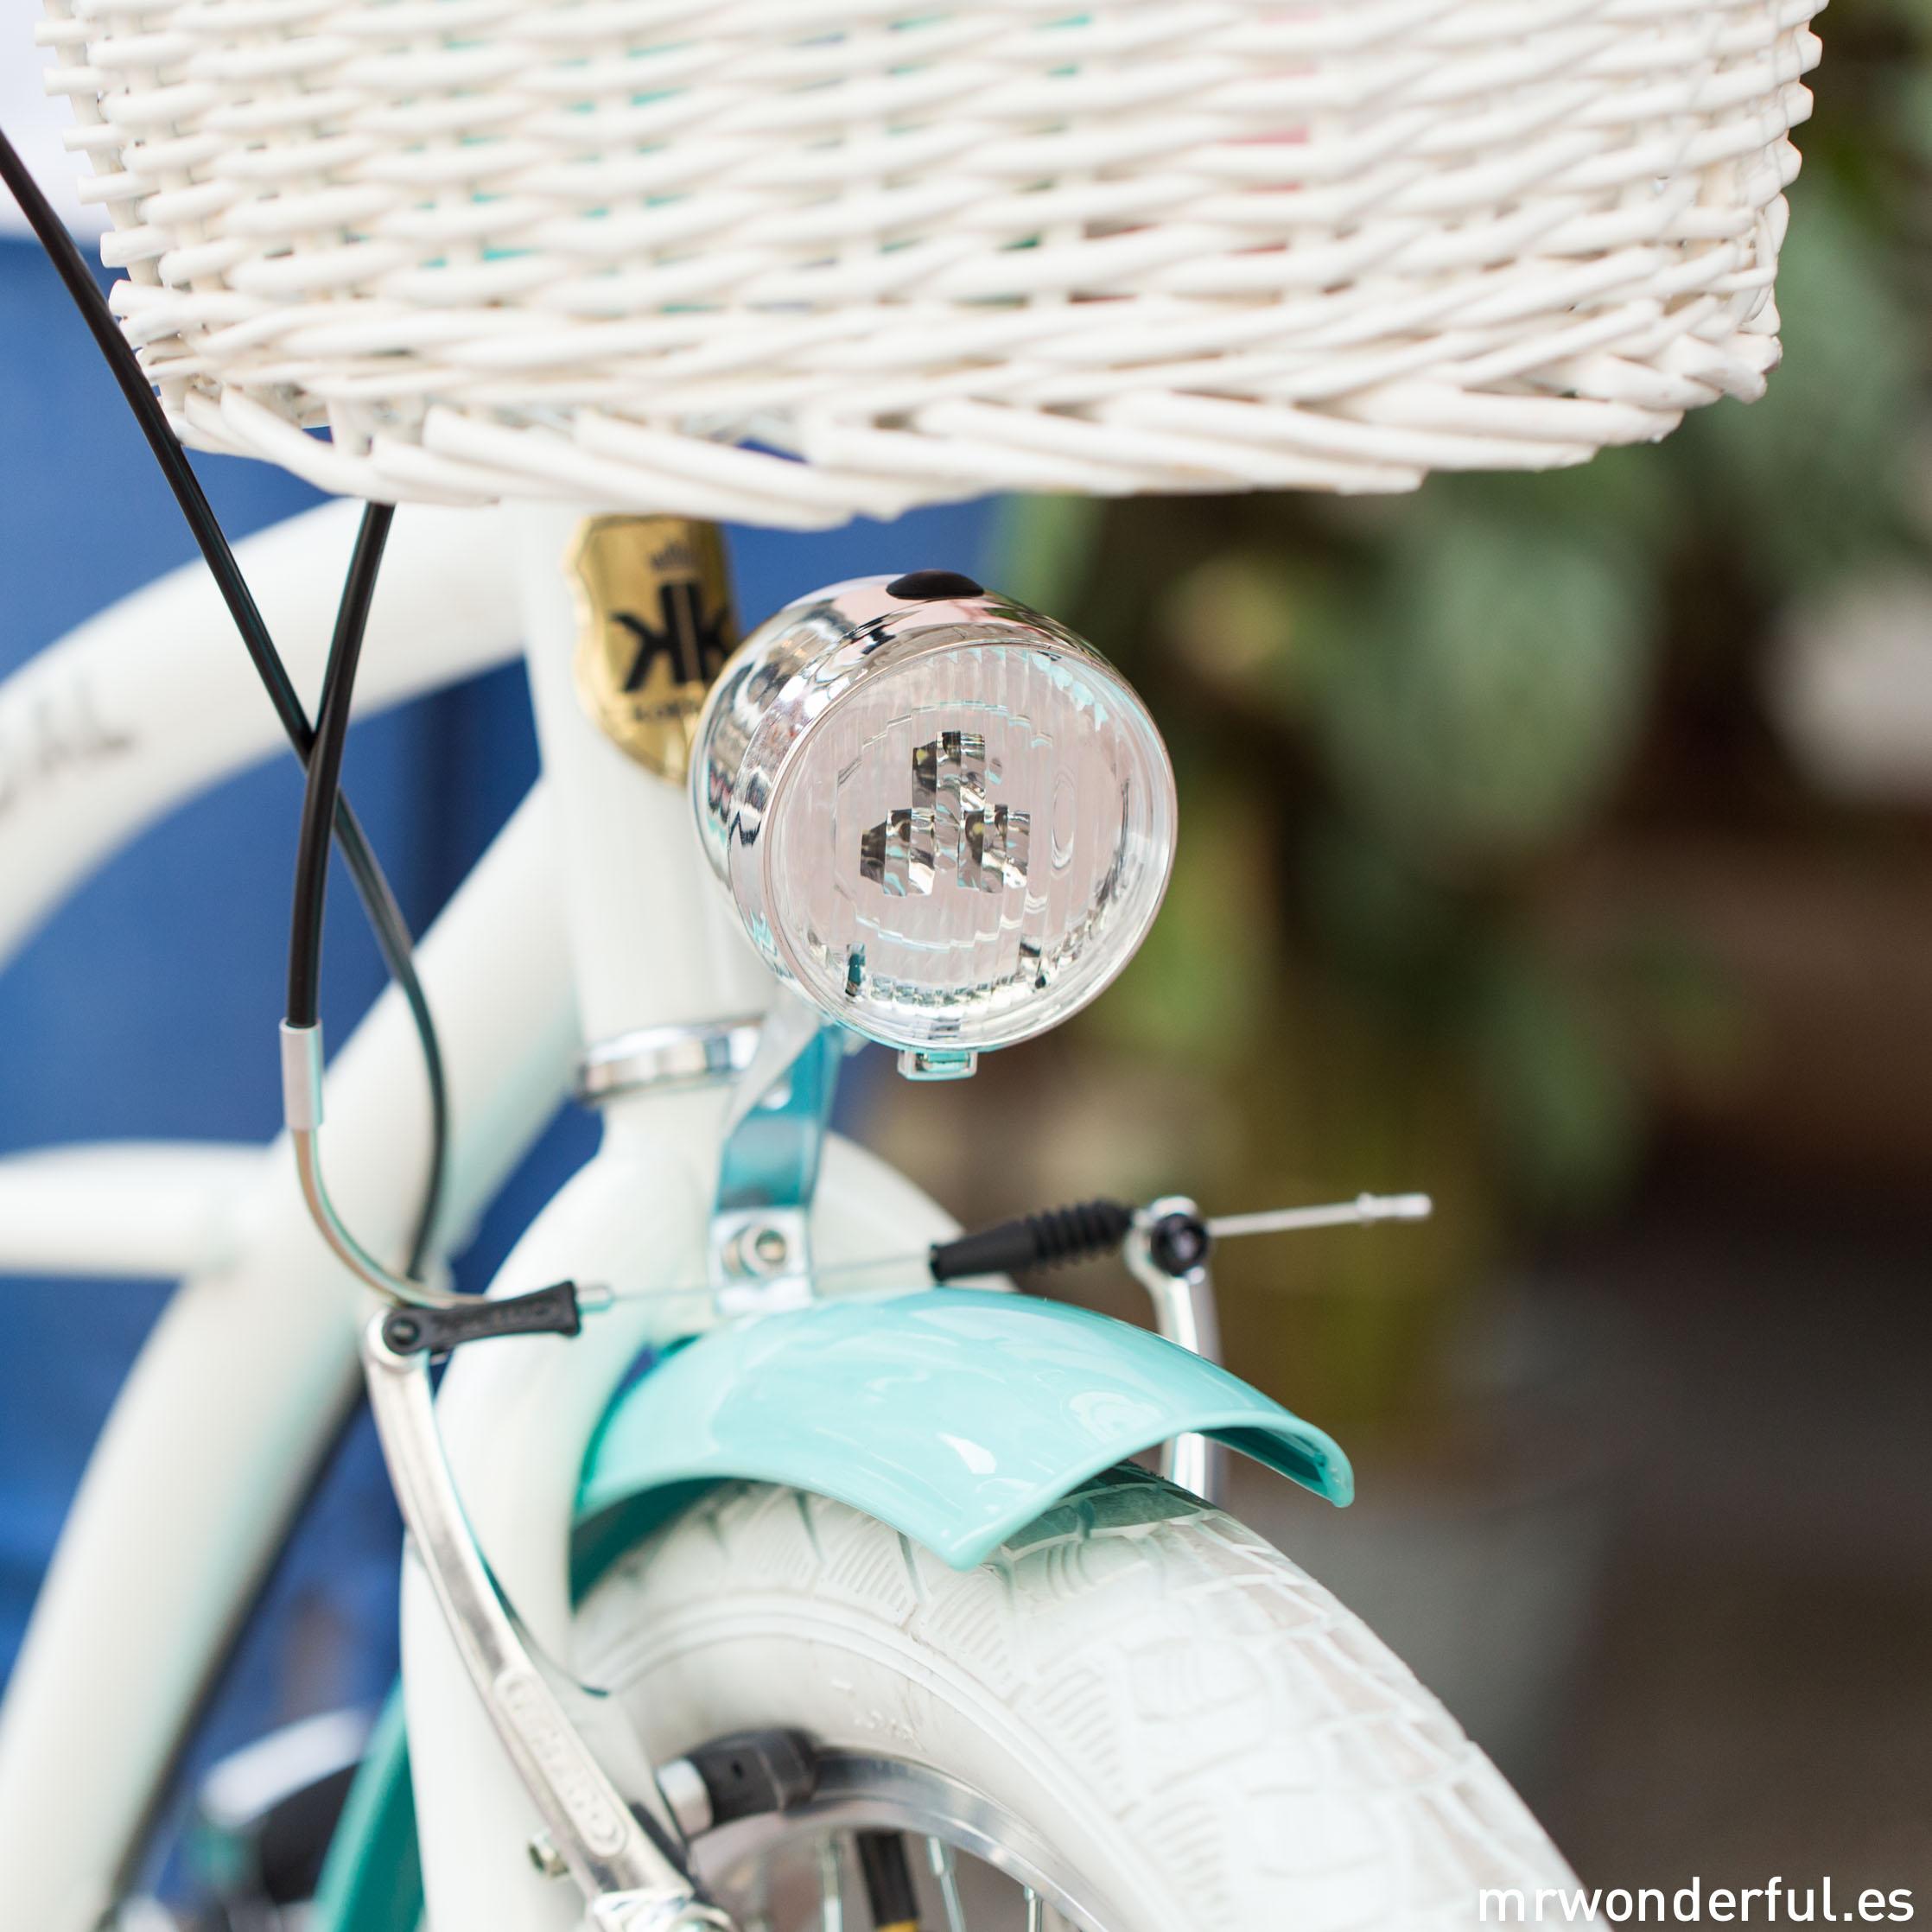 mrwonderful_concurso-bicicleta-9-Editar